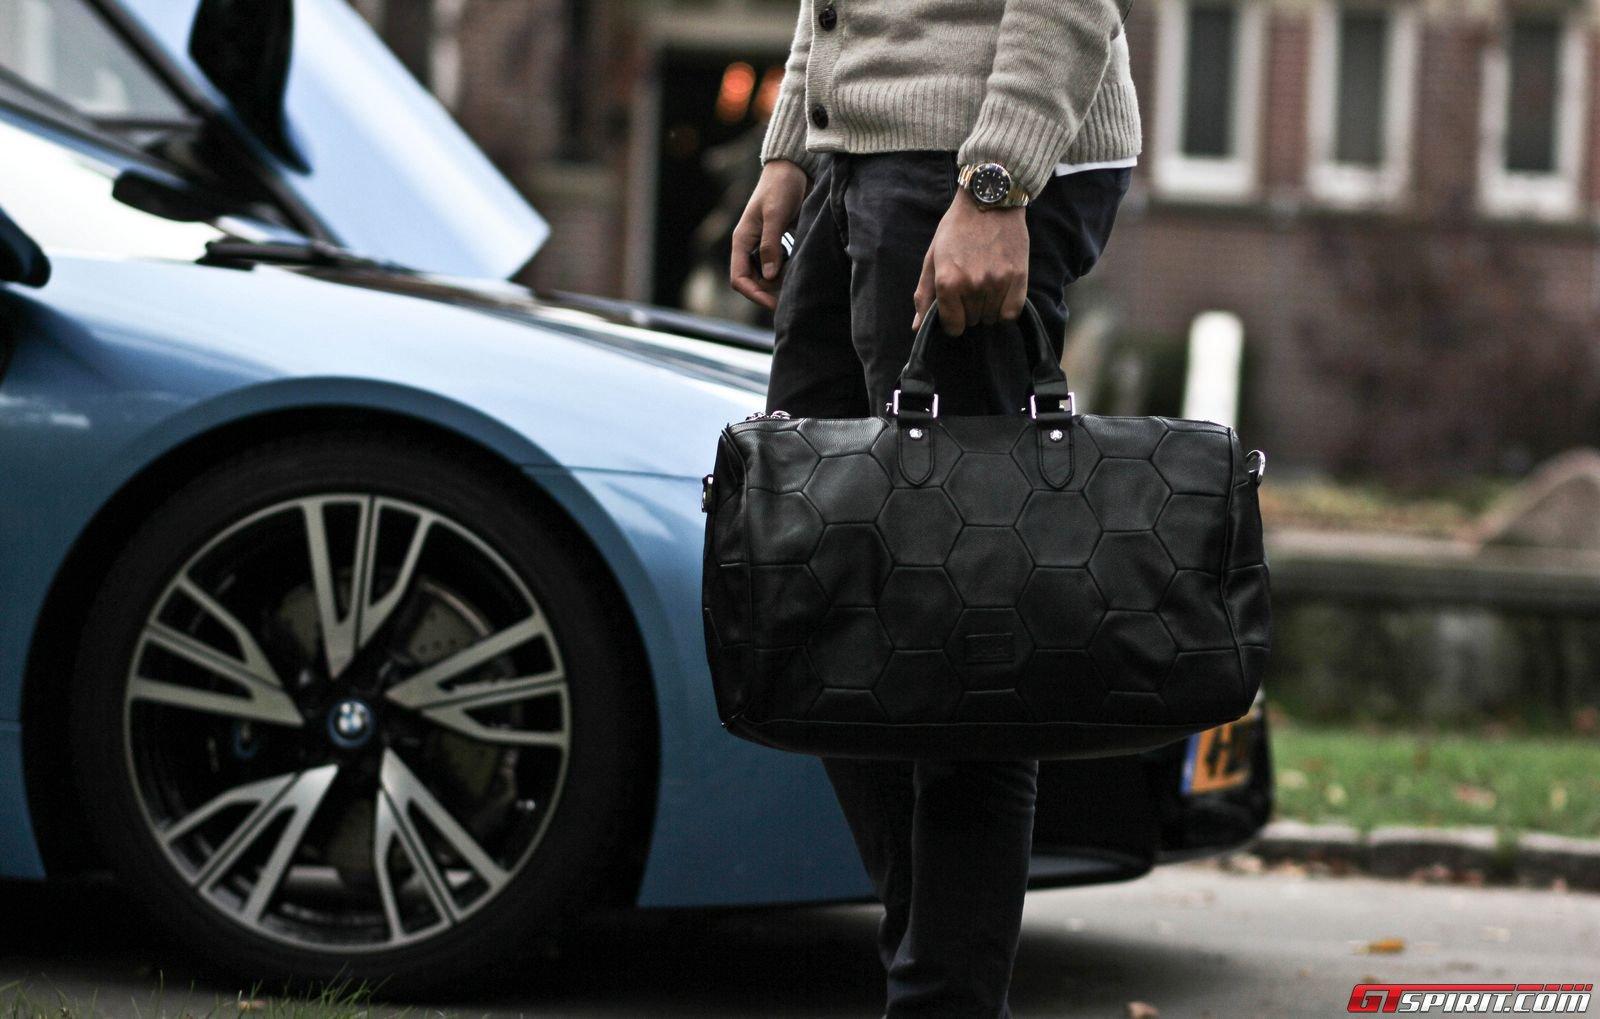 Auto Garage Rotterdam : Luxury lifestyle photoshoot in rotterdam the netherlands gtspirit